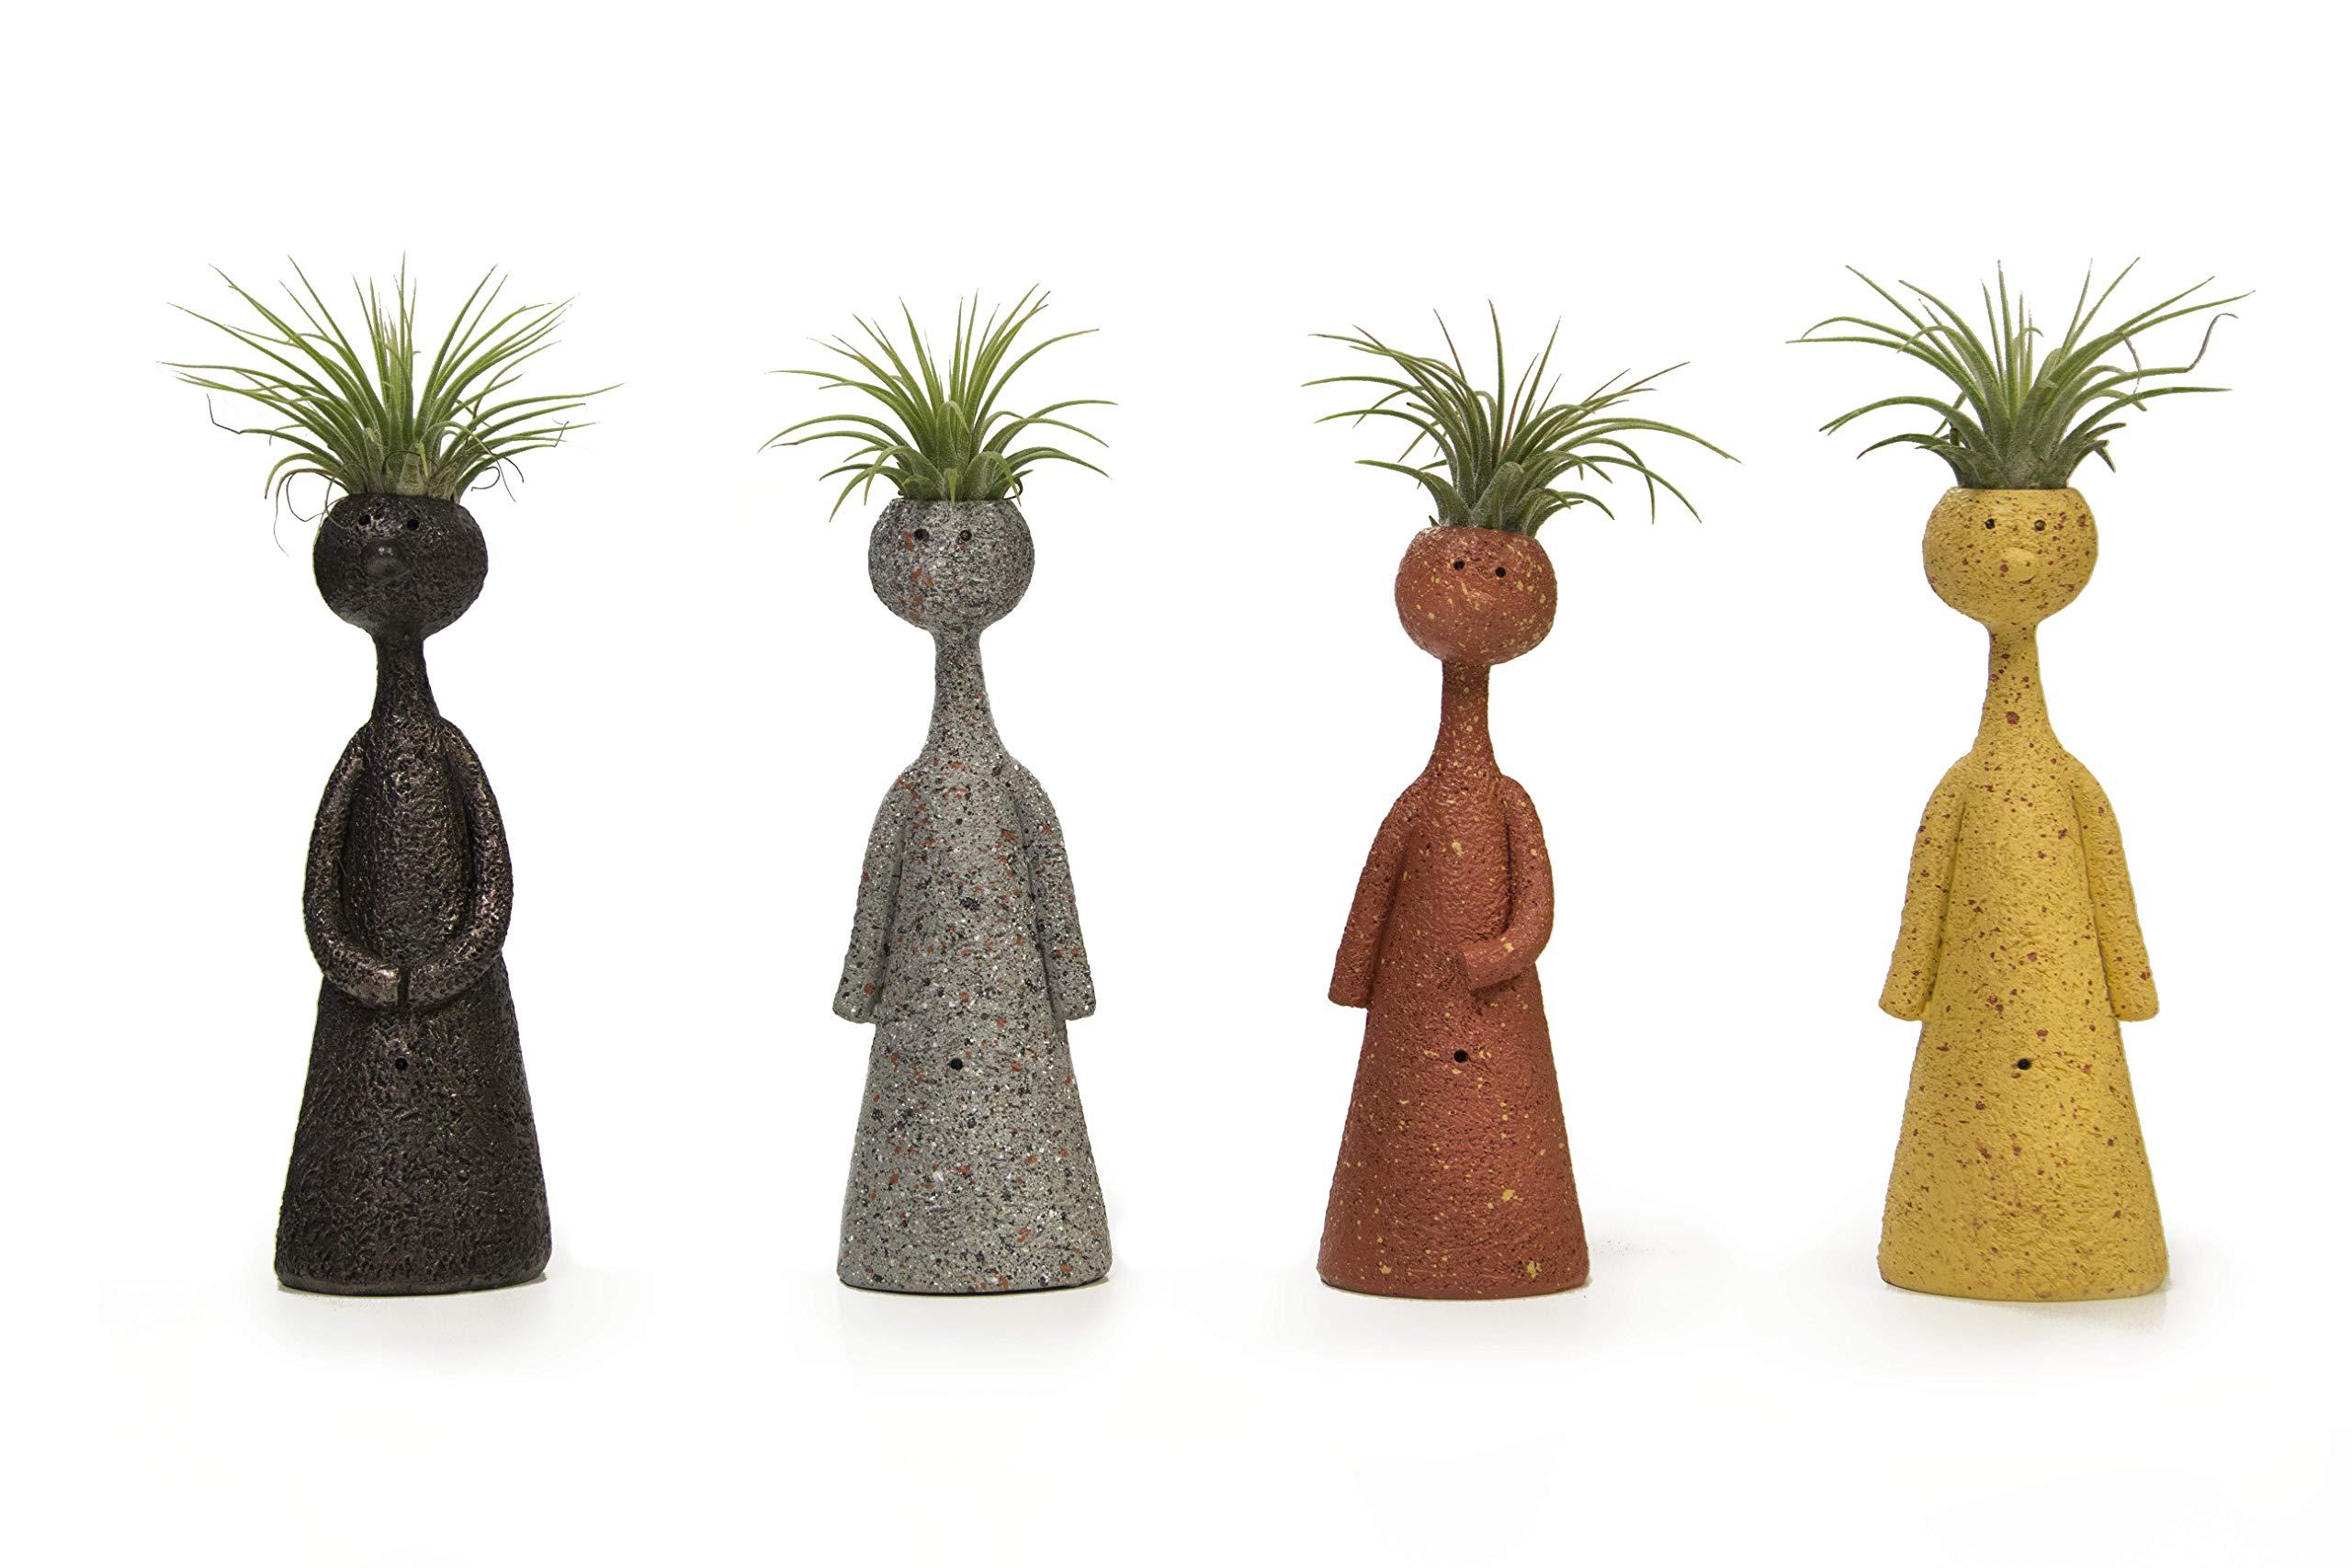 LiveTrends Design LT LiveTrends -Thinkers (Set of 4) Living Plant Décor Assorted